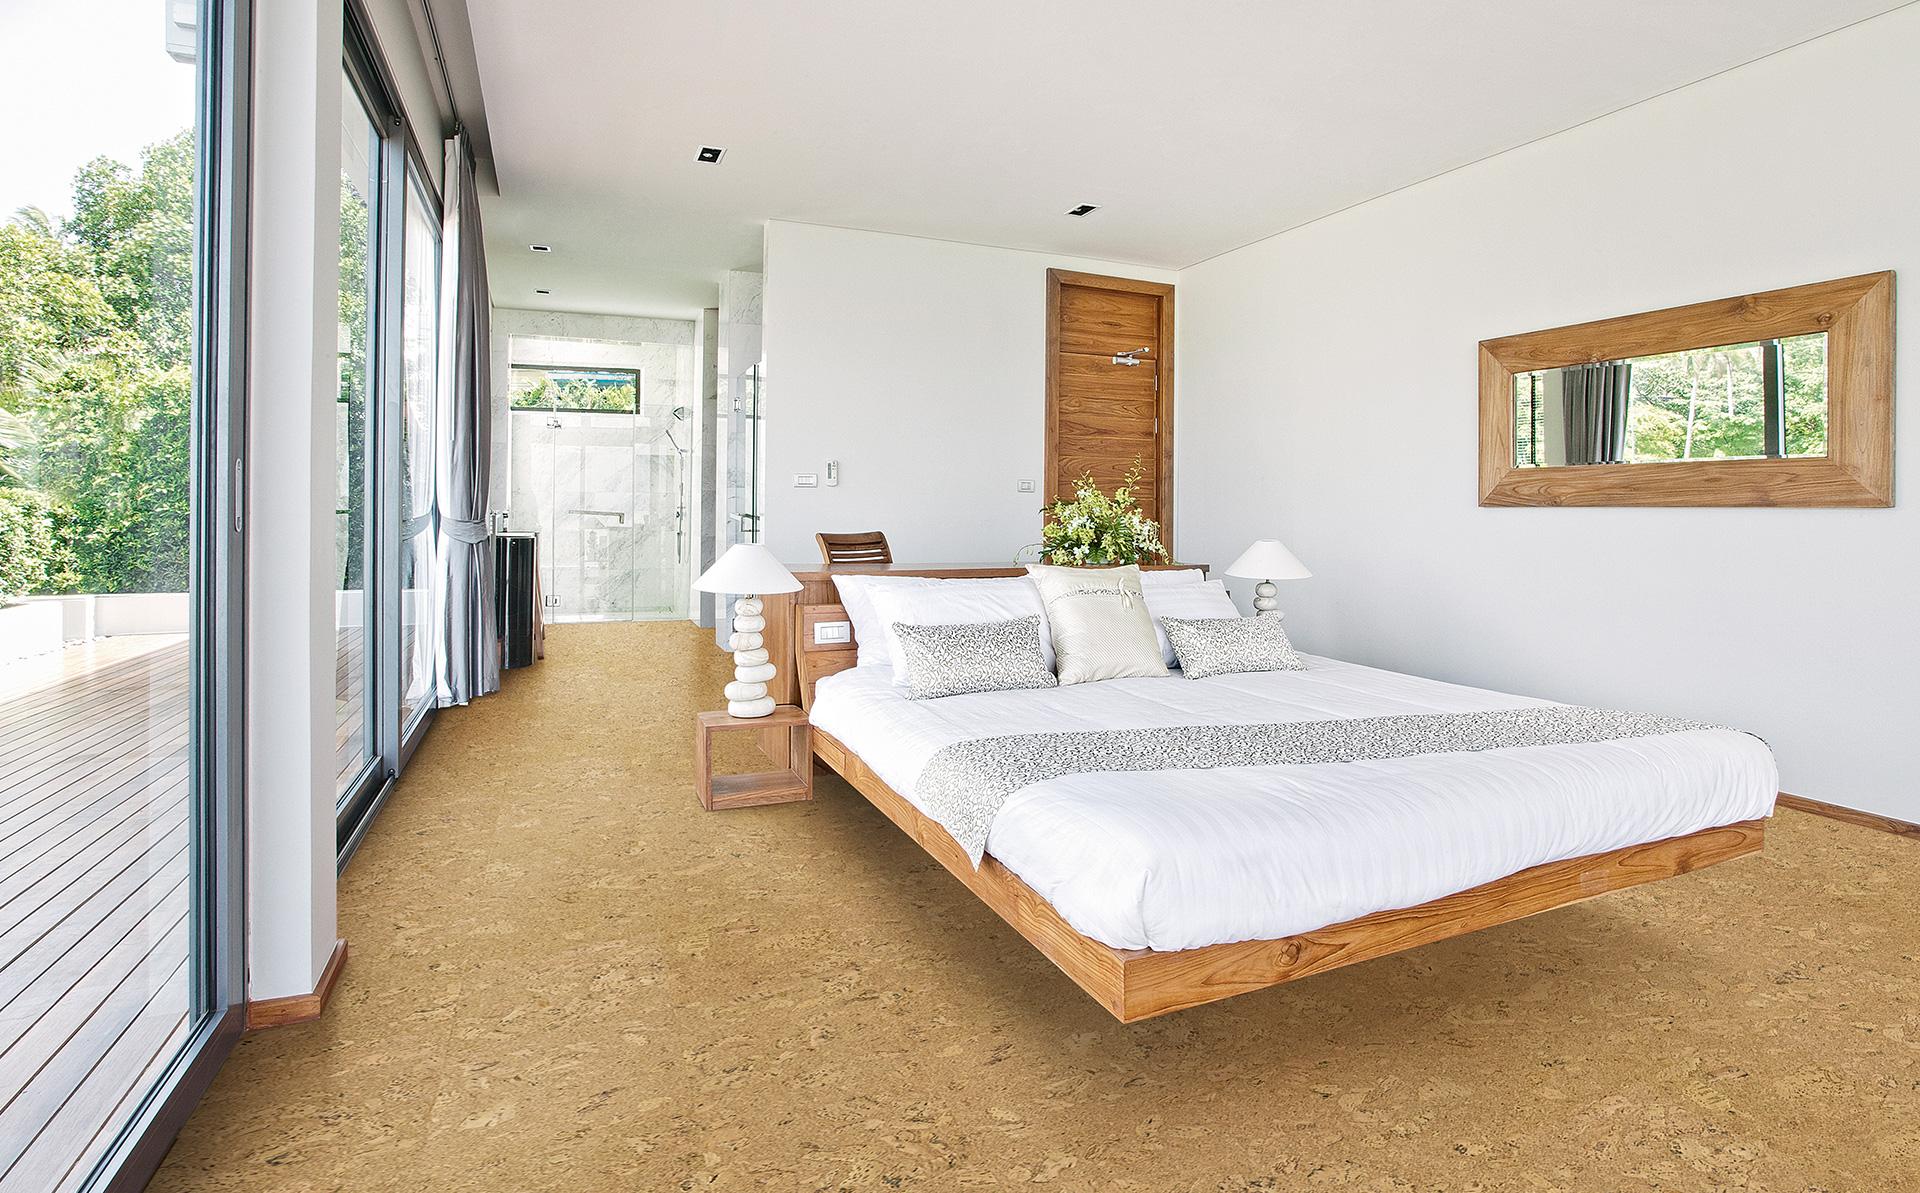 Bodenbelag Schlafzimmer Kork – Caseconrad.com